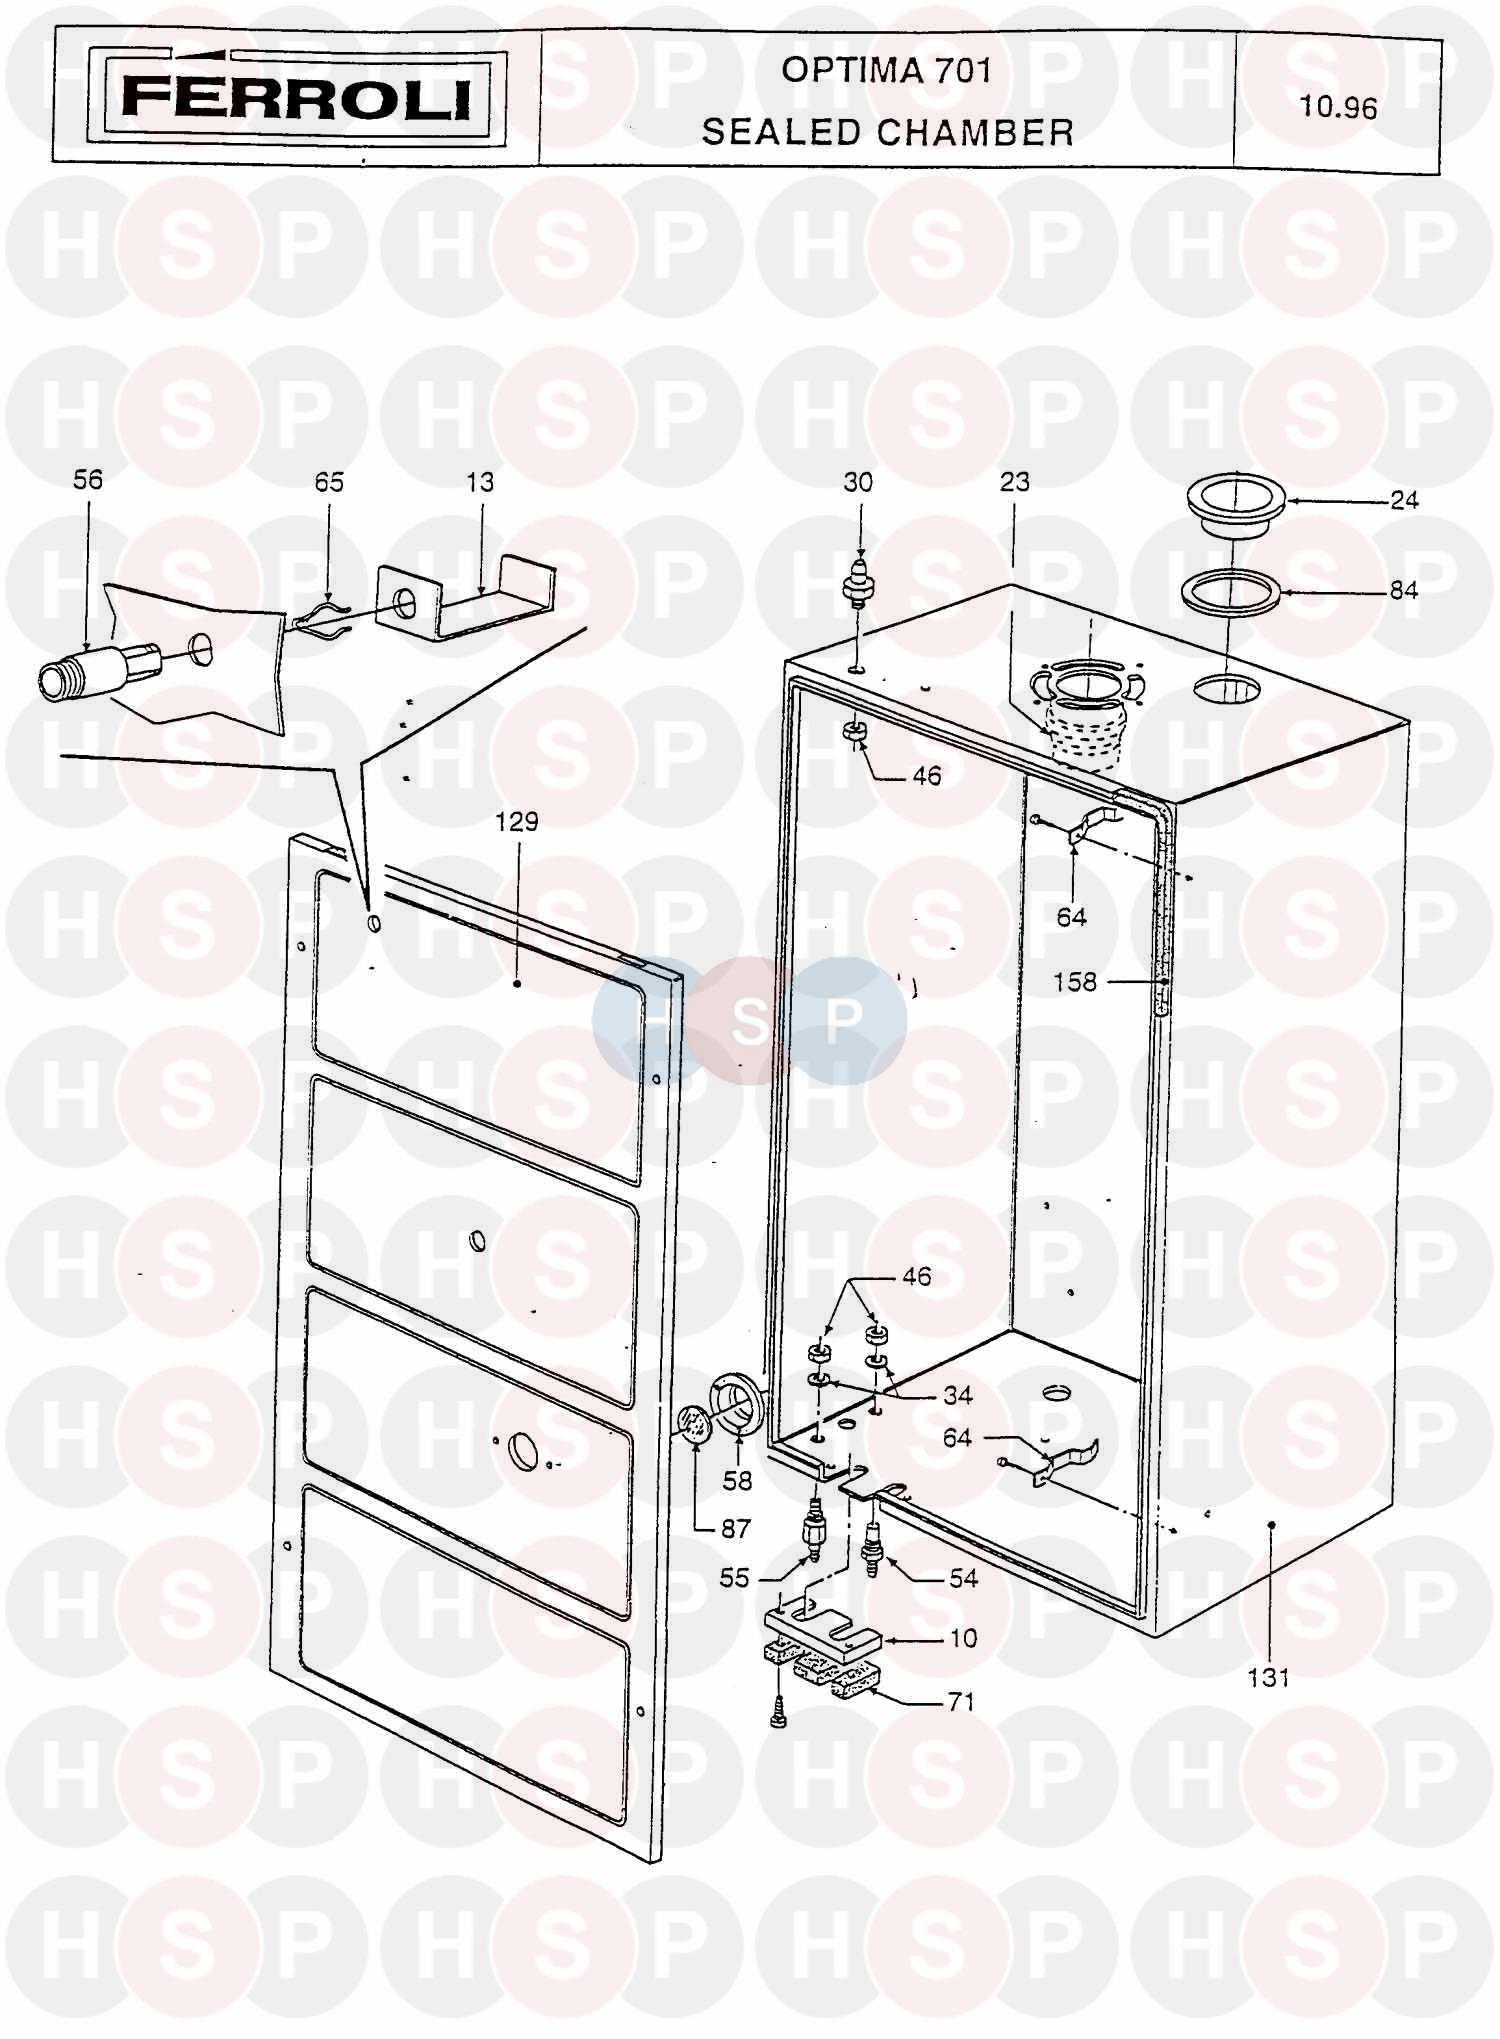 ferroli optima 701 boiler assembly 2 diagram heating spare